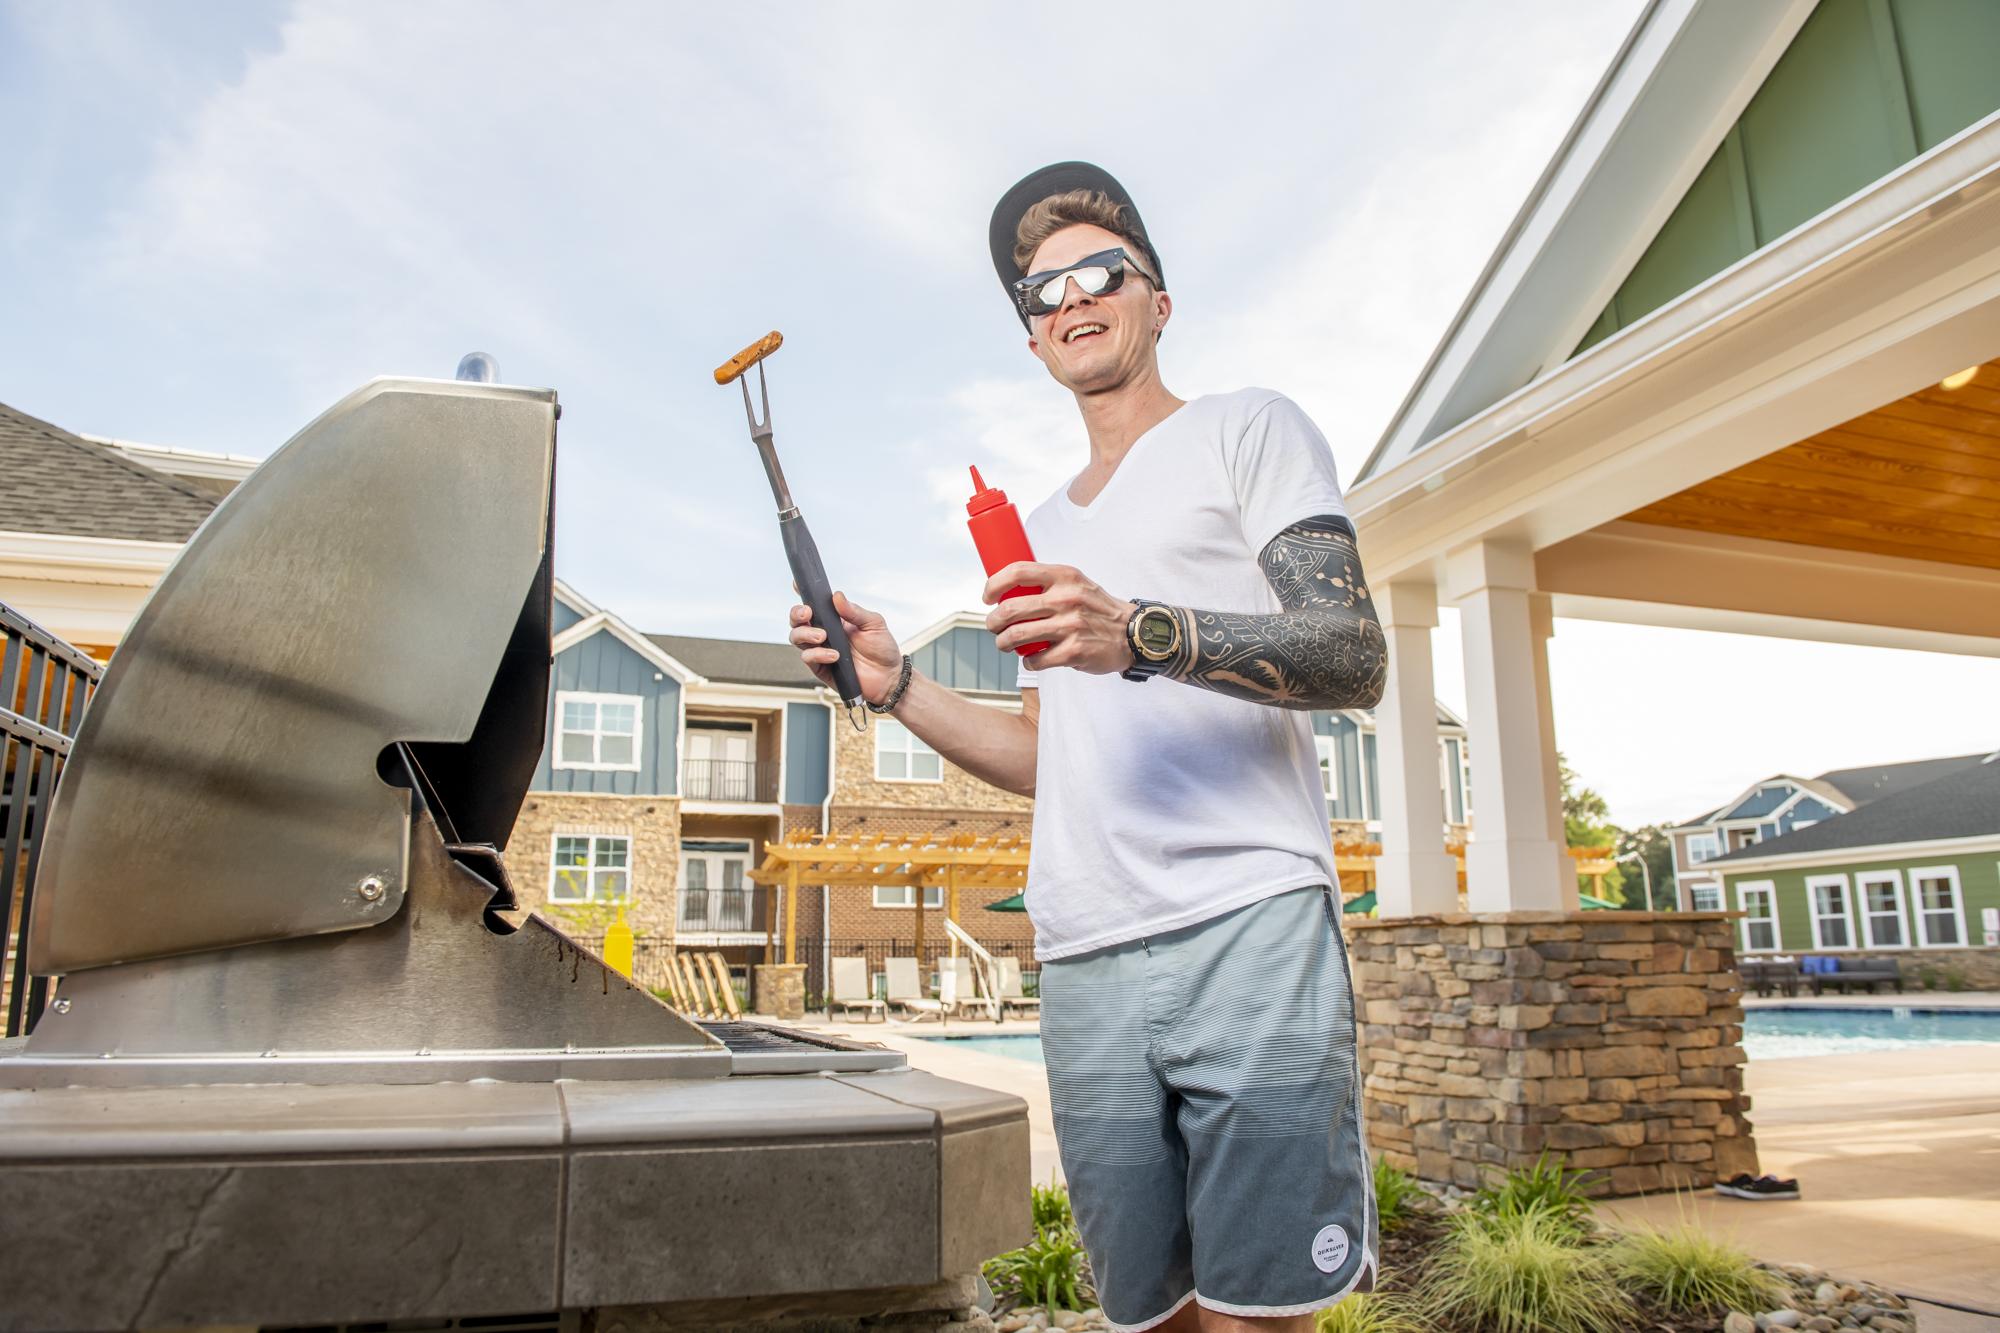 guy grilling hotdogs at evolve summer recipes